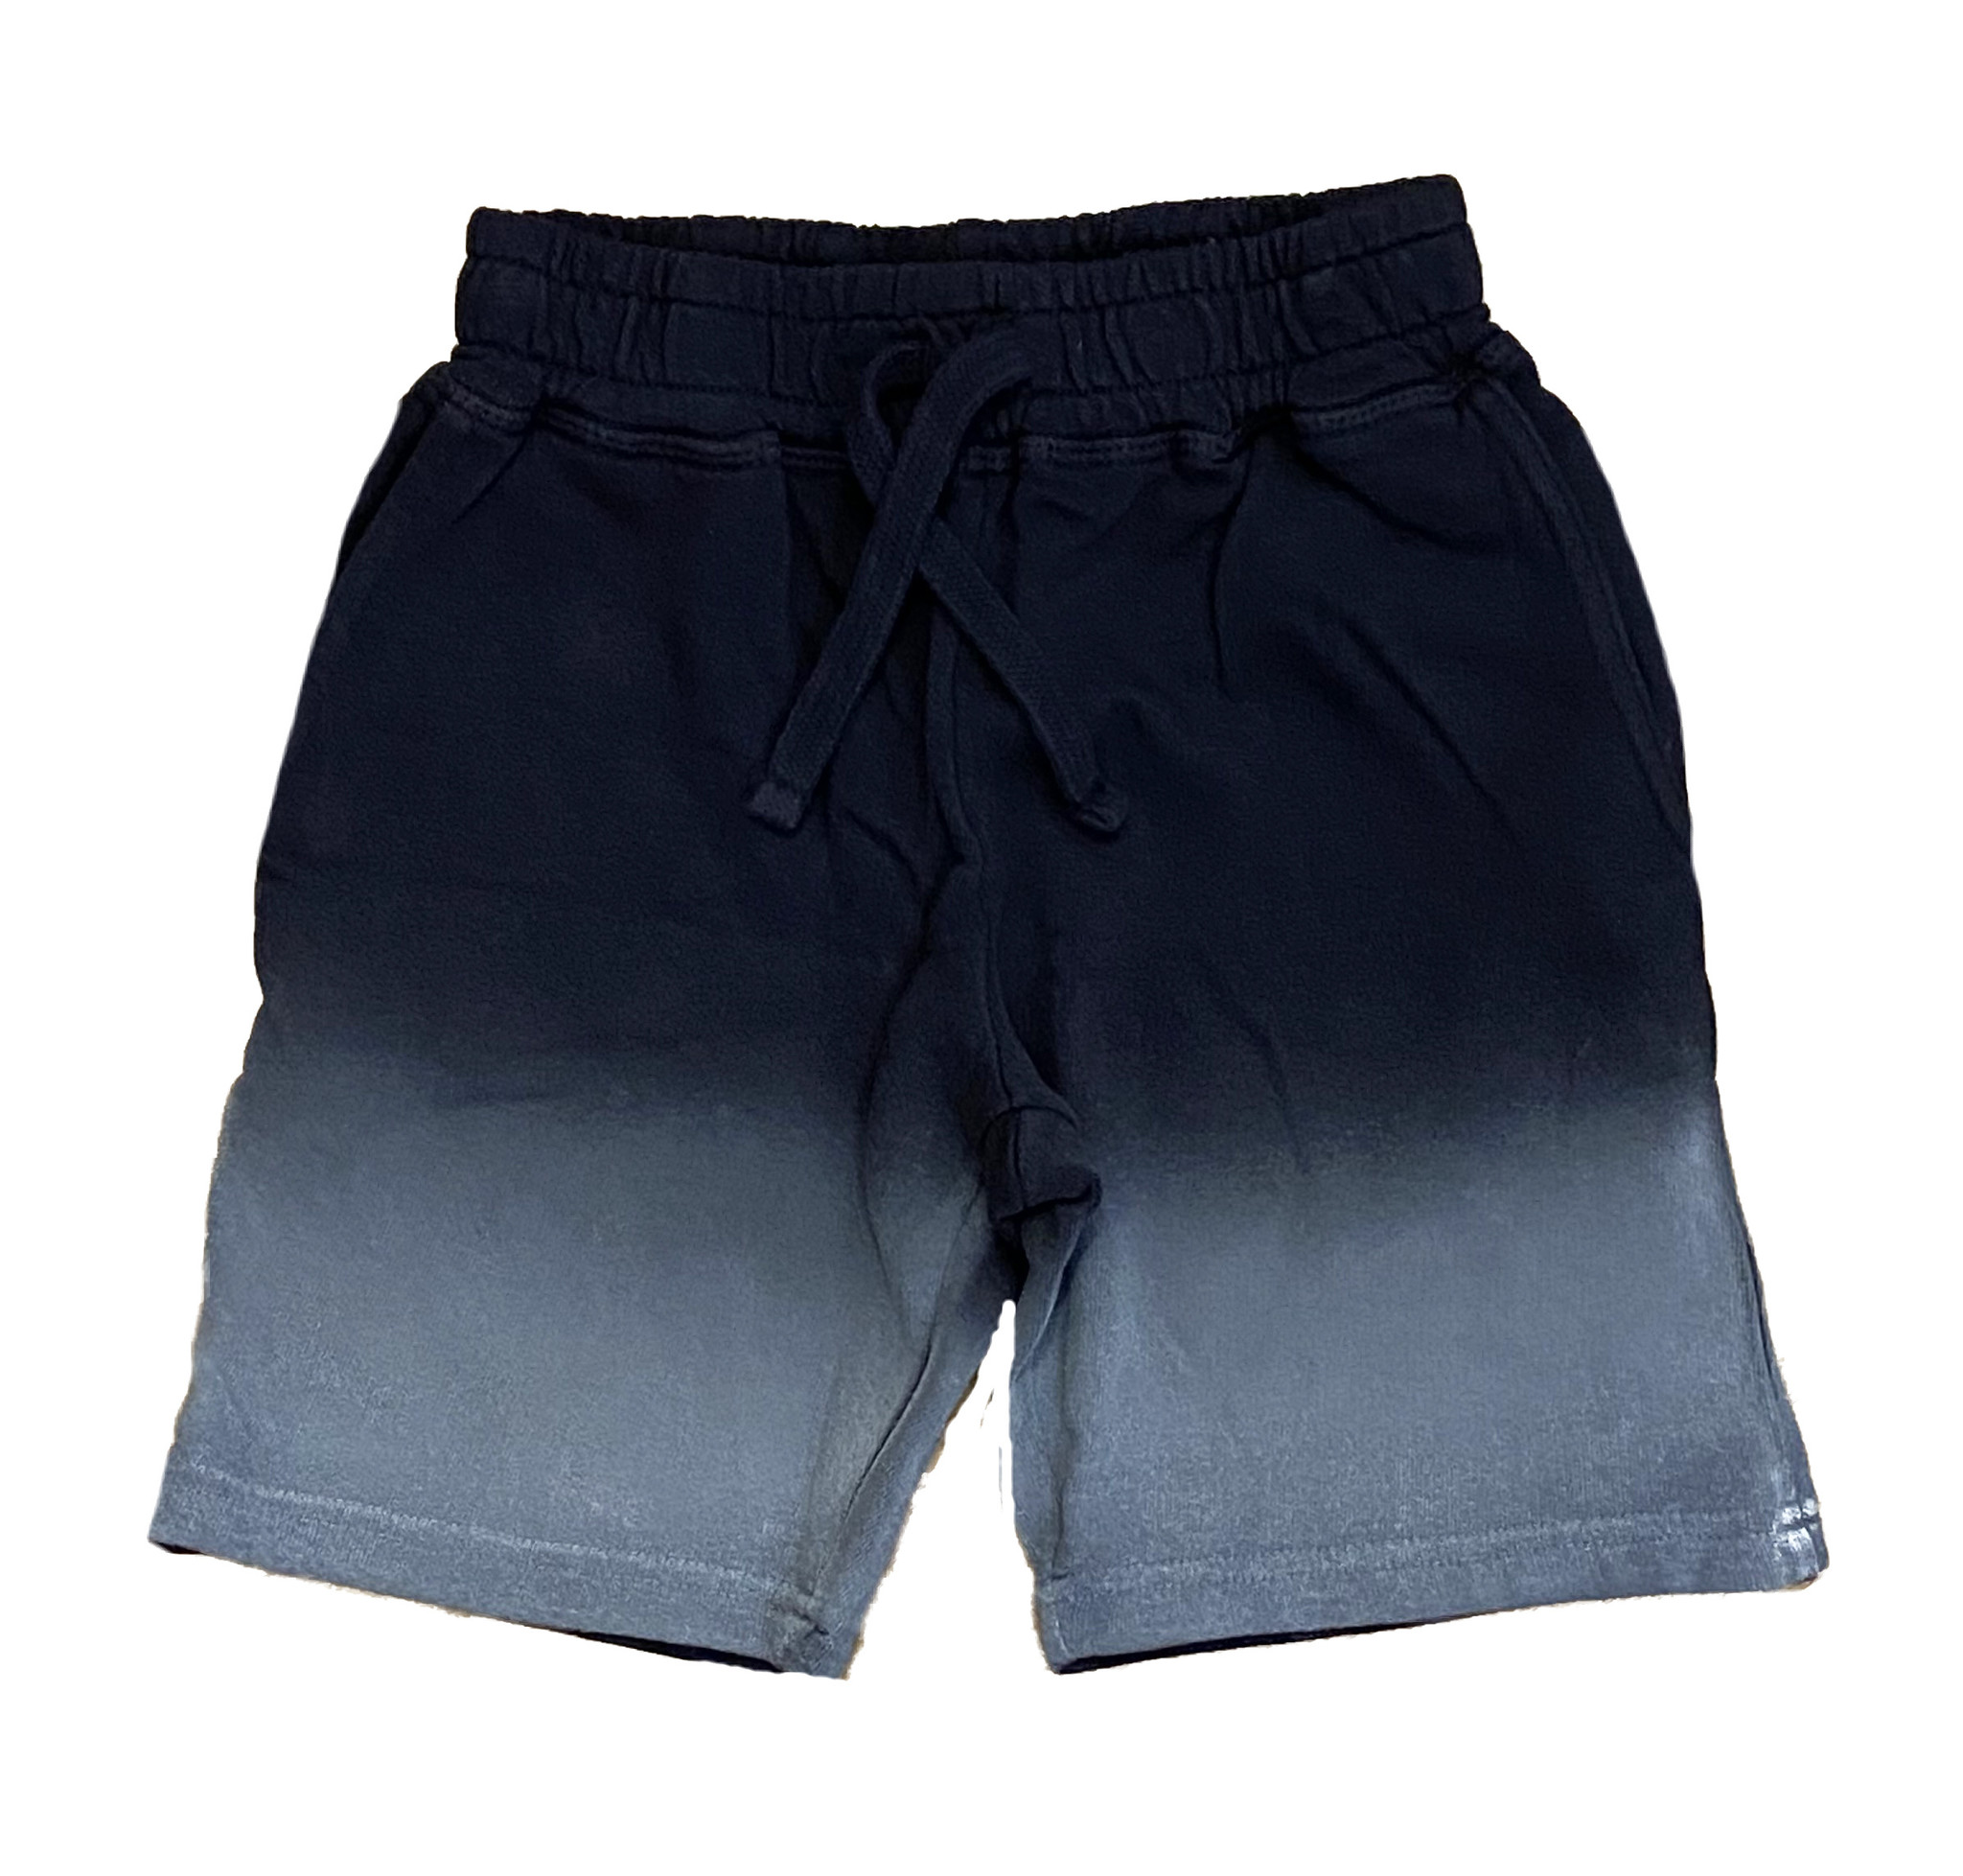 Mish Navy Ombre Shorts